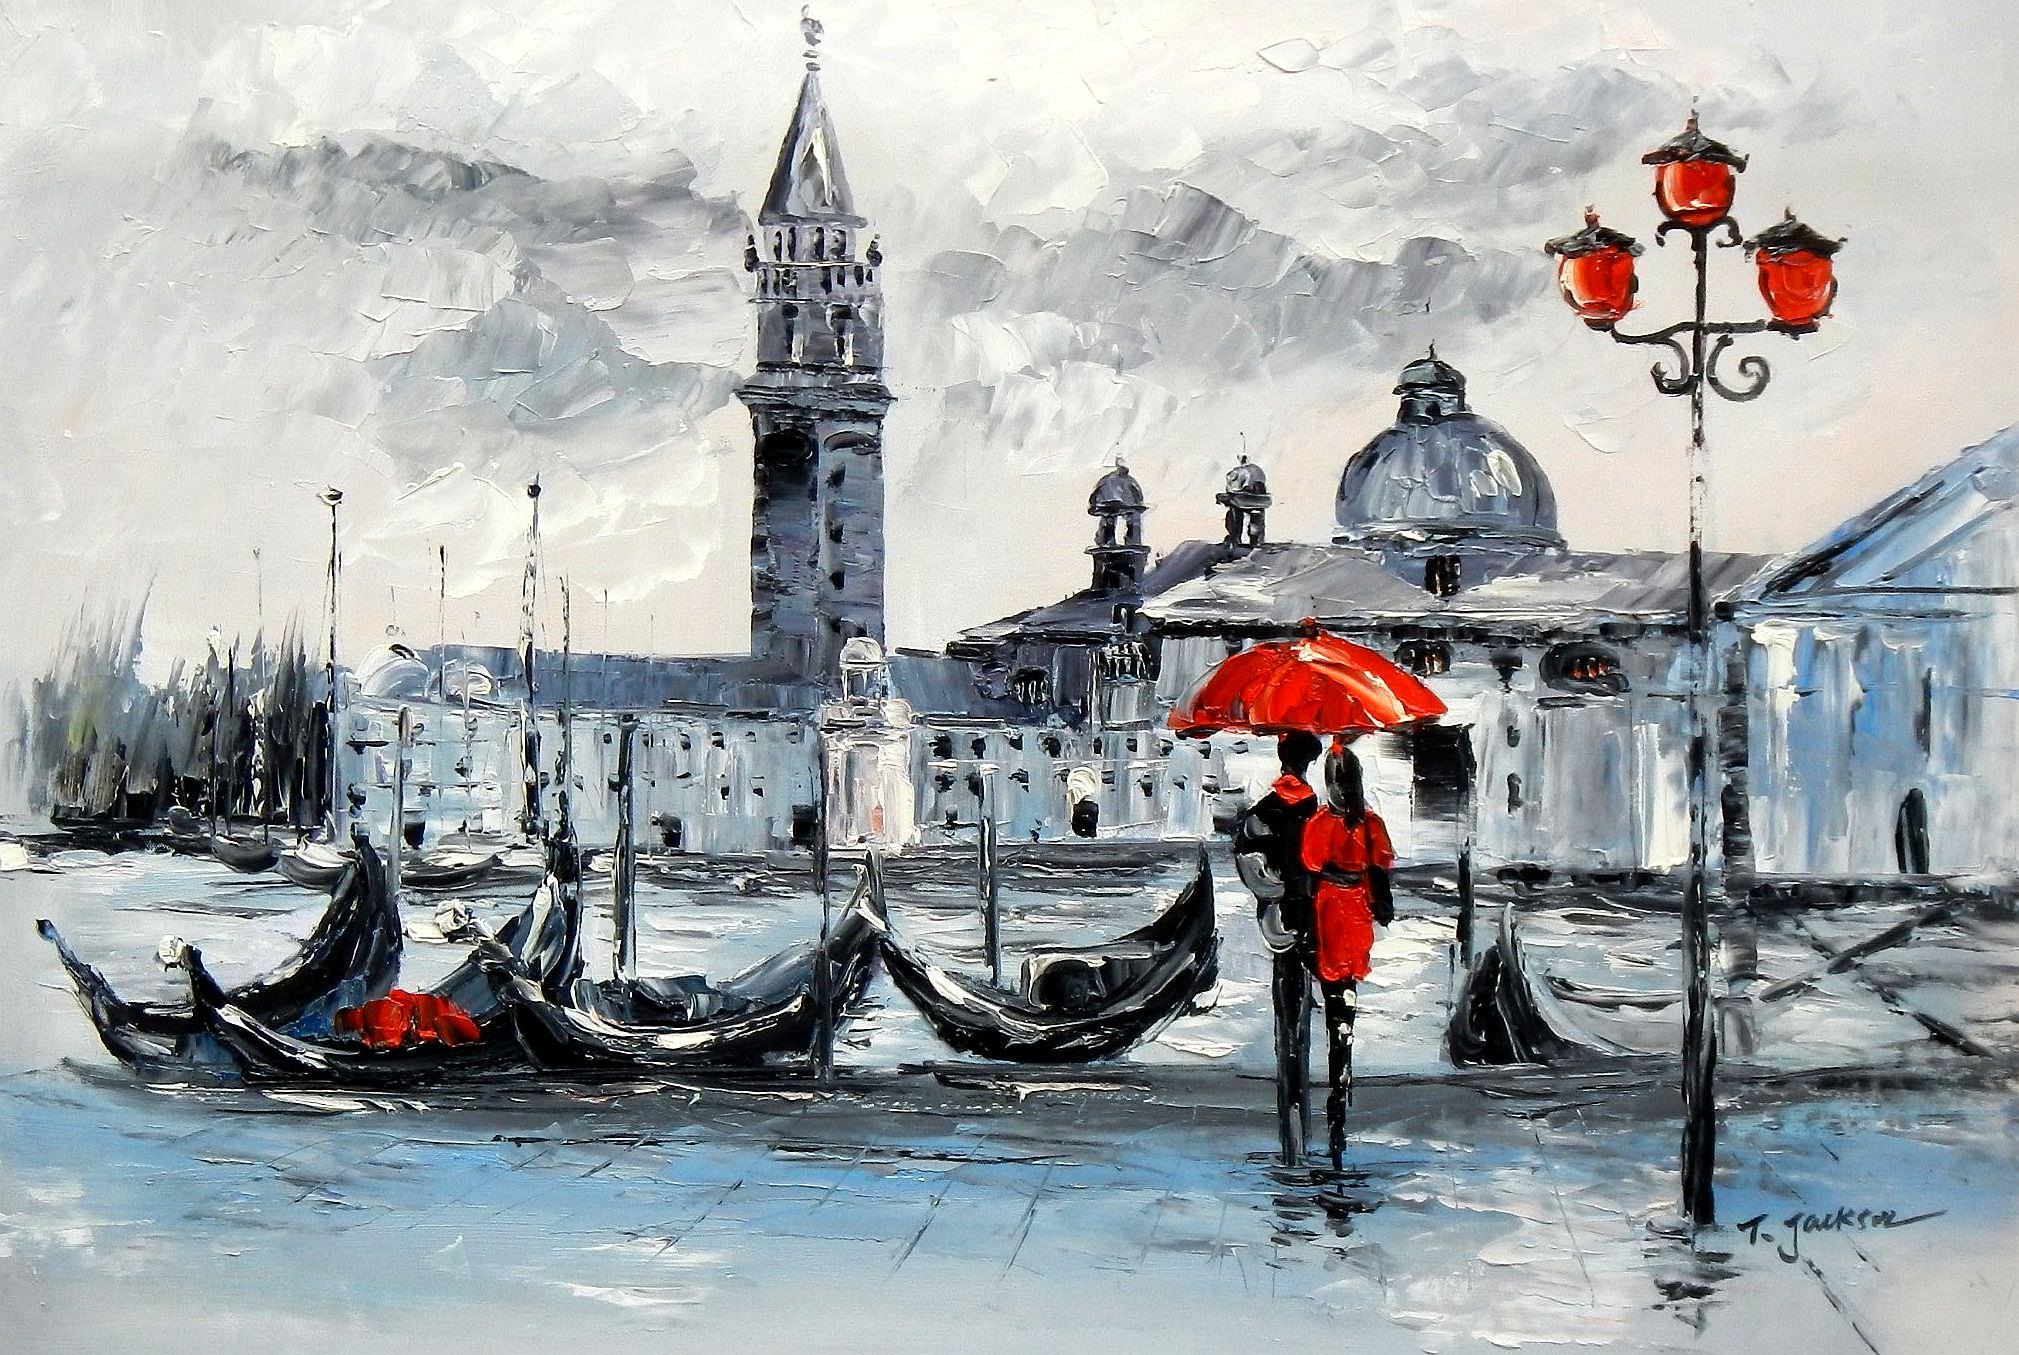 Venedig am Dogenpalast d95841 60x90cm Ölgemälde handgemalt